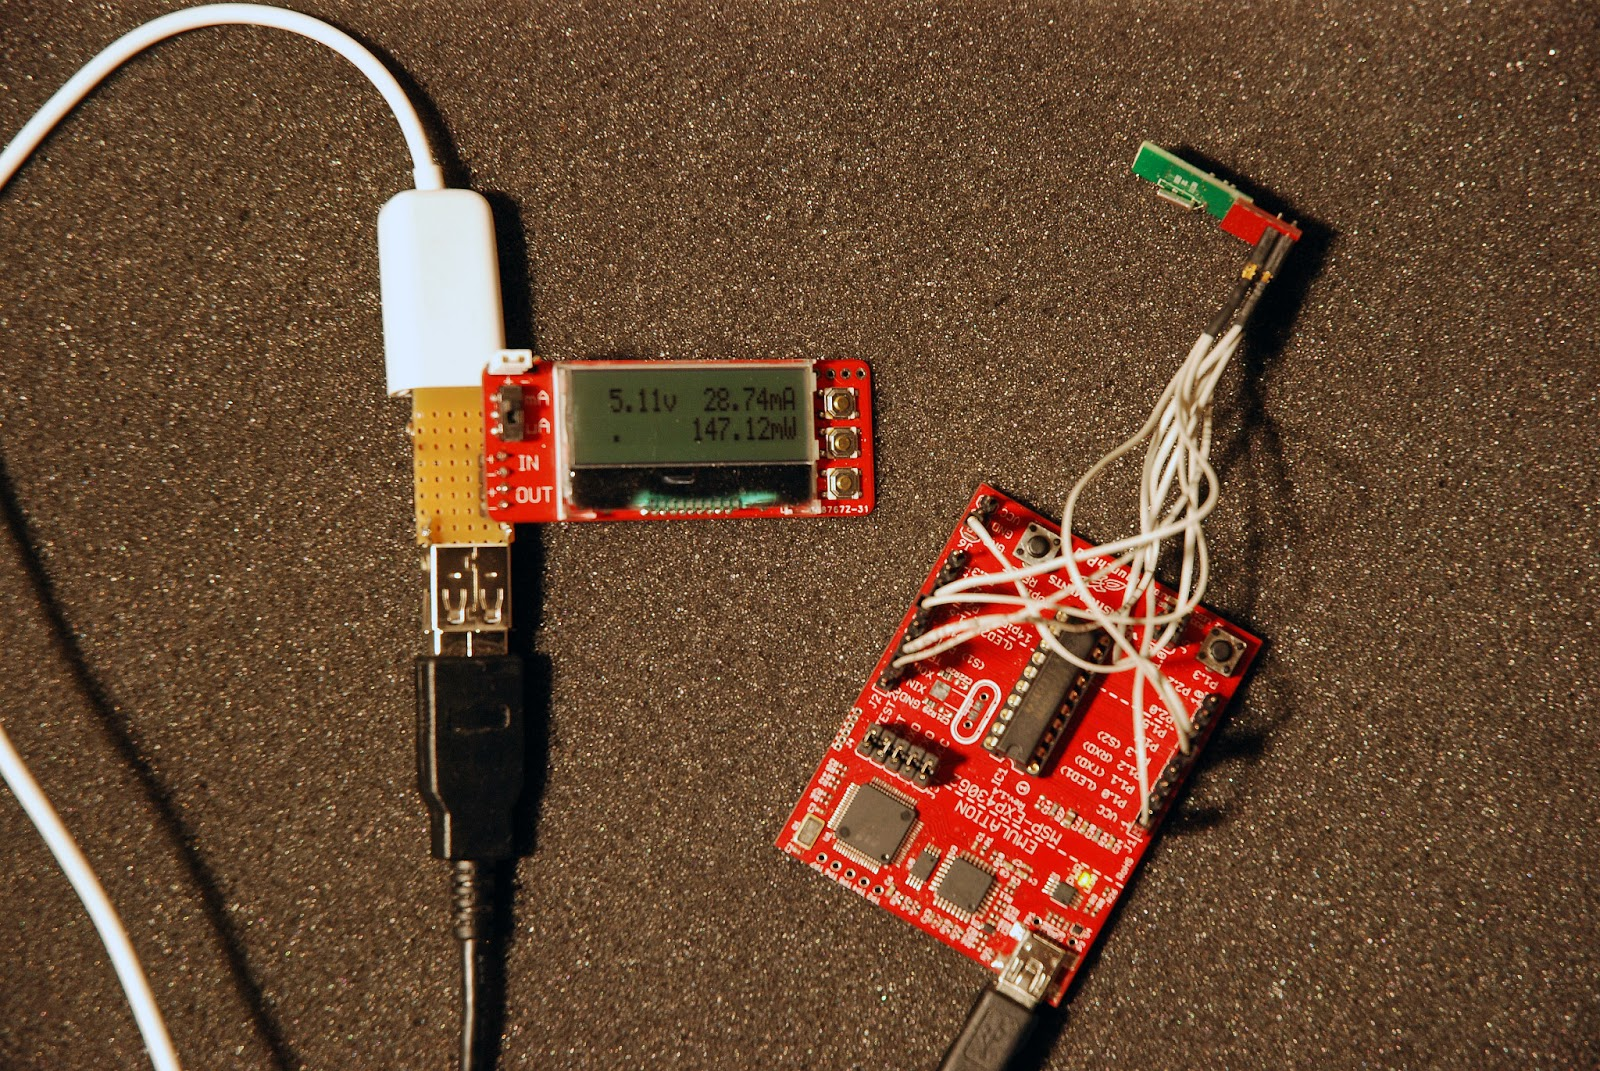 Rubi's World of embedded Electronics: July 2013